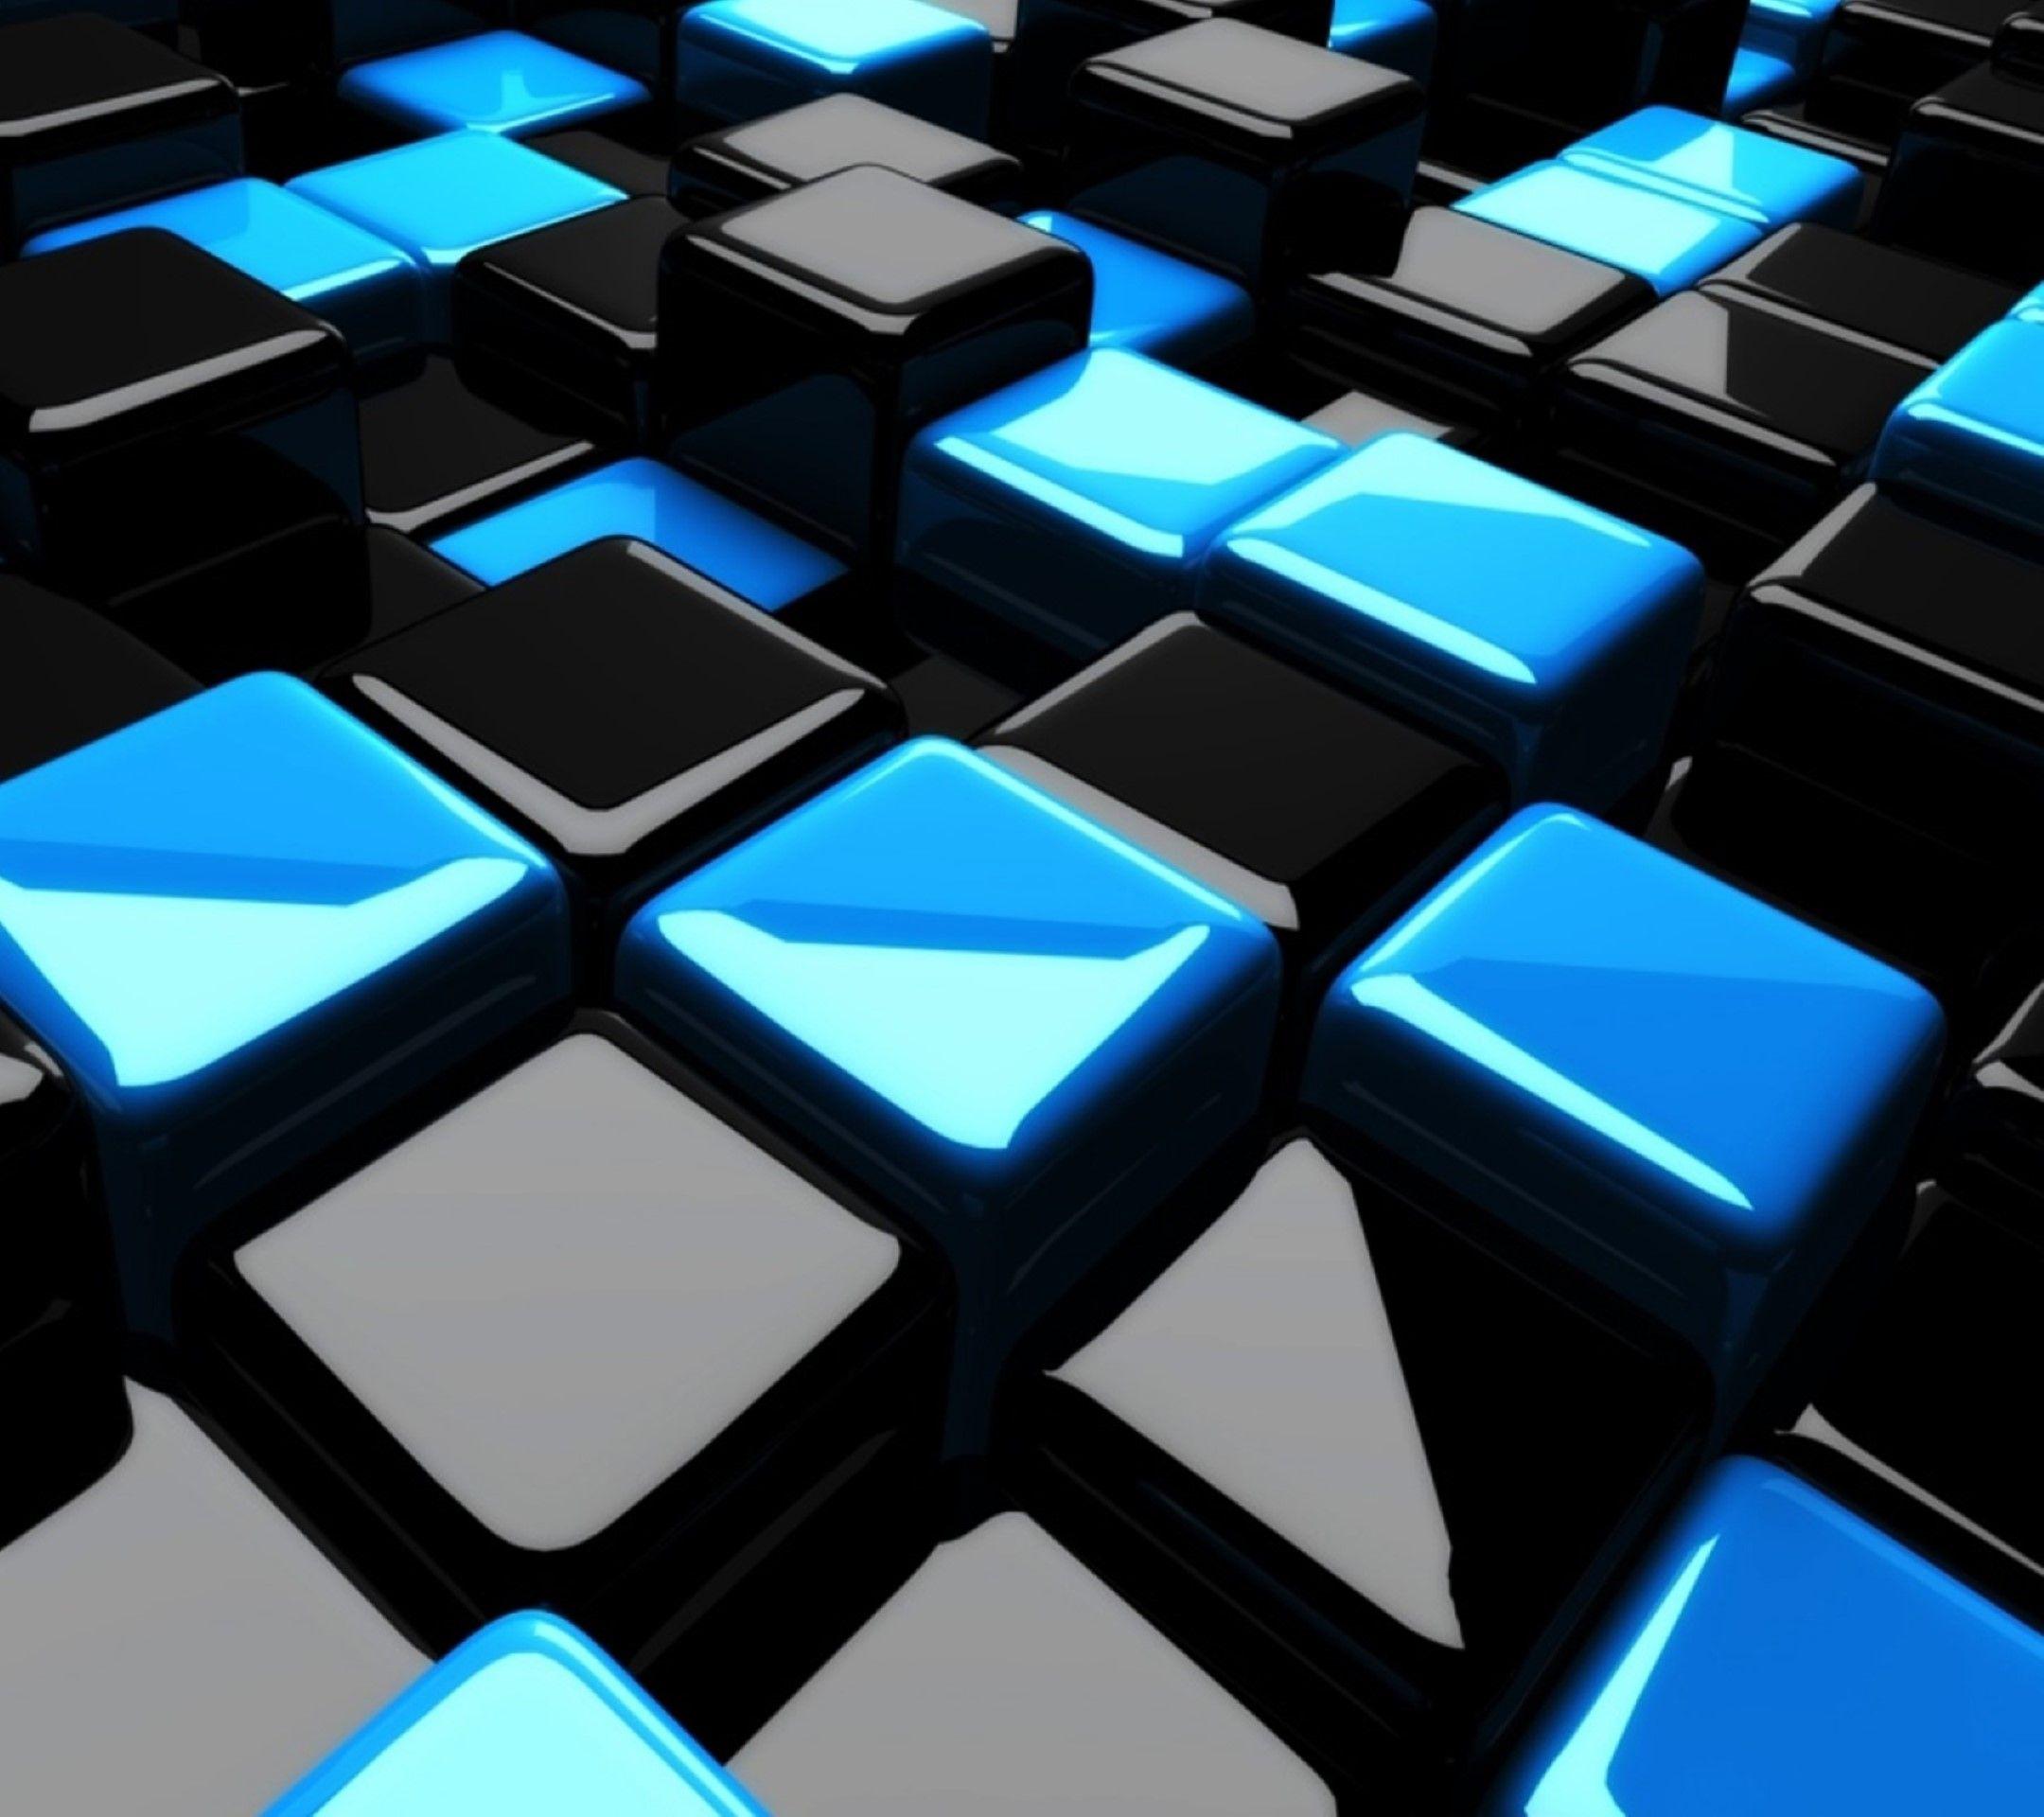 black n blue mobile wallpaper mobile9 3d geometric shapes